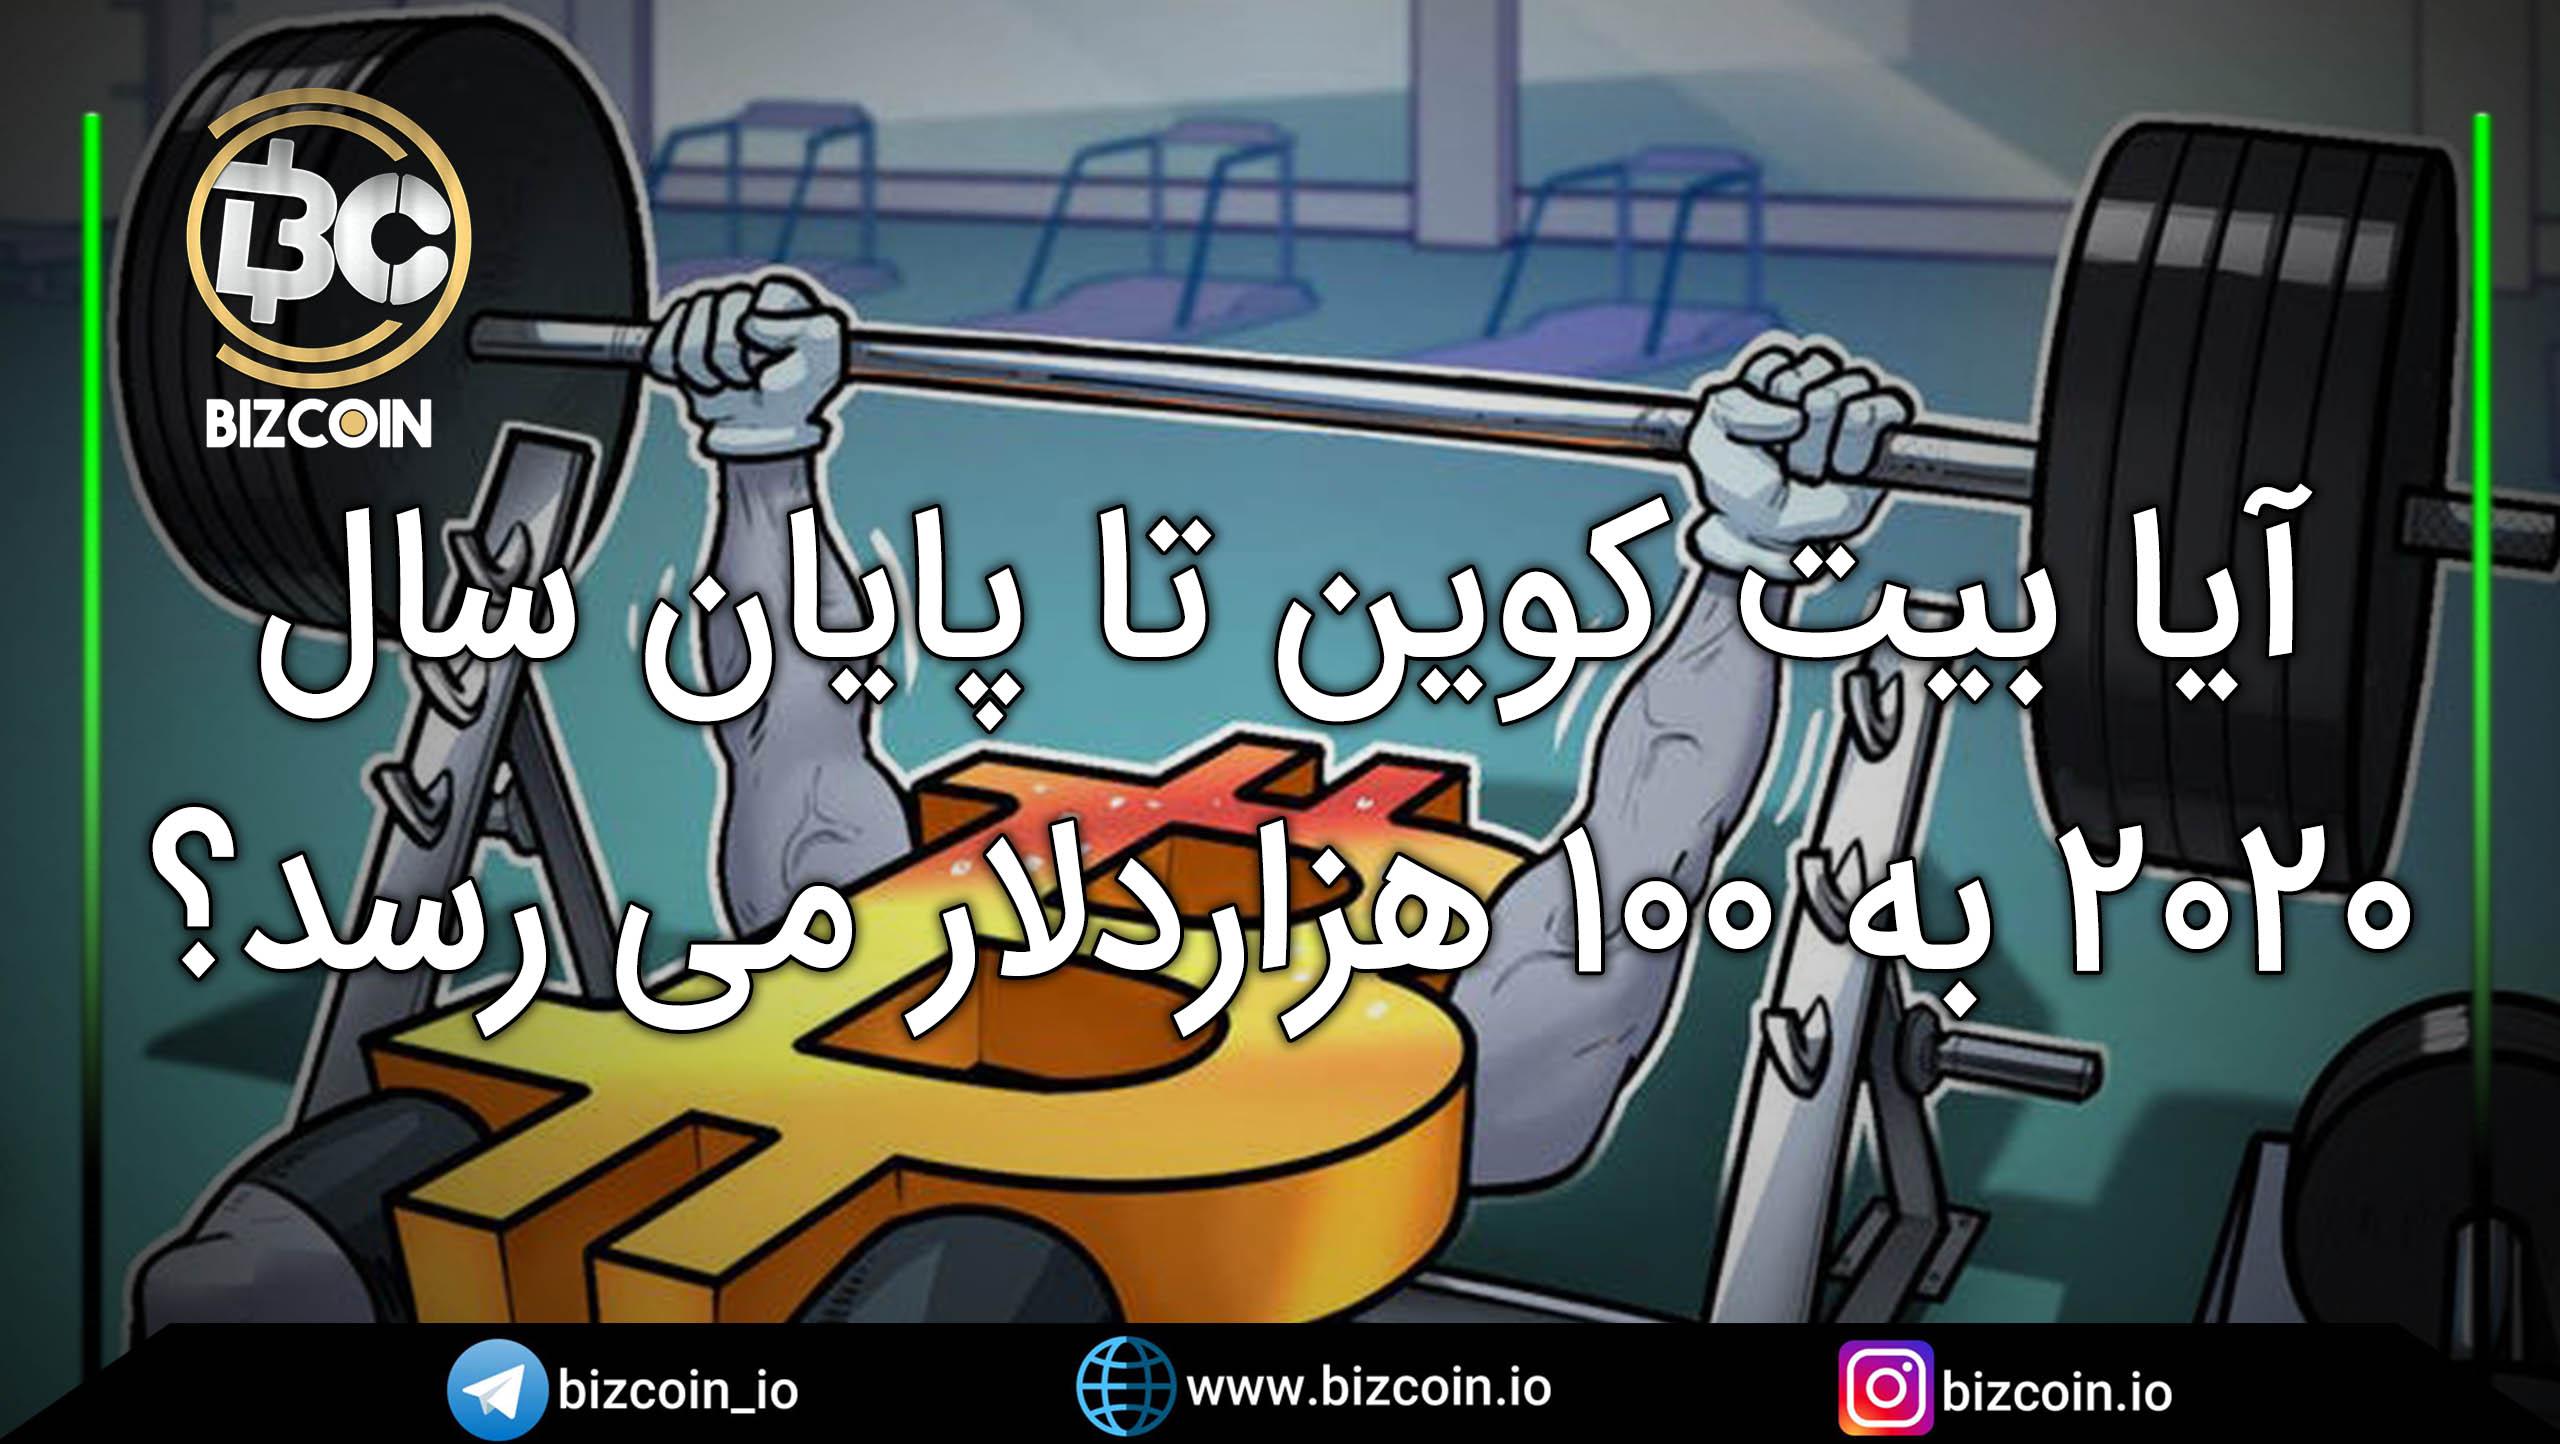 Will Bitcoin reach 100000 by the end of 2020 آیا بیت کوین تا پایان سال ۲۰۲۰ به ۱۰۰ هزاردلار می رسد؟